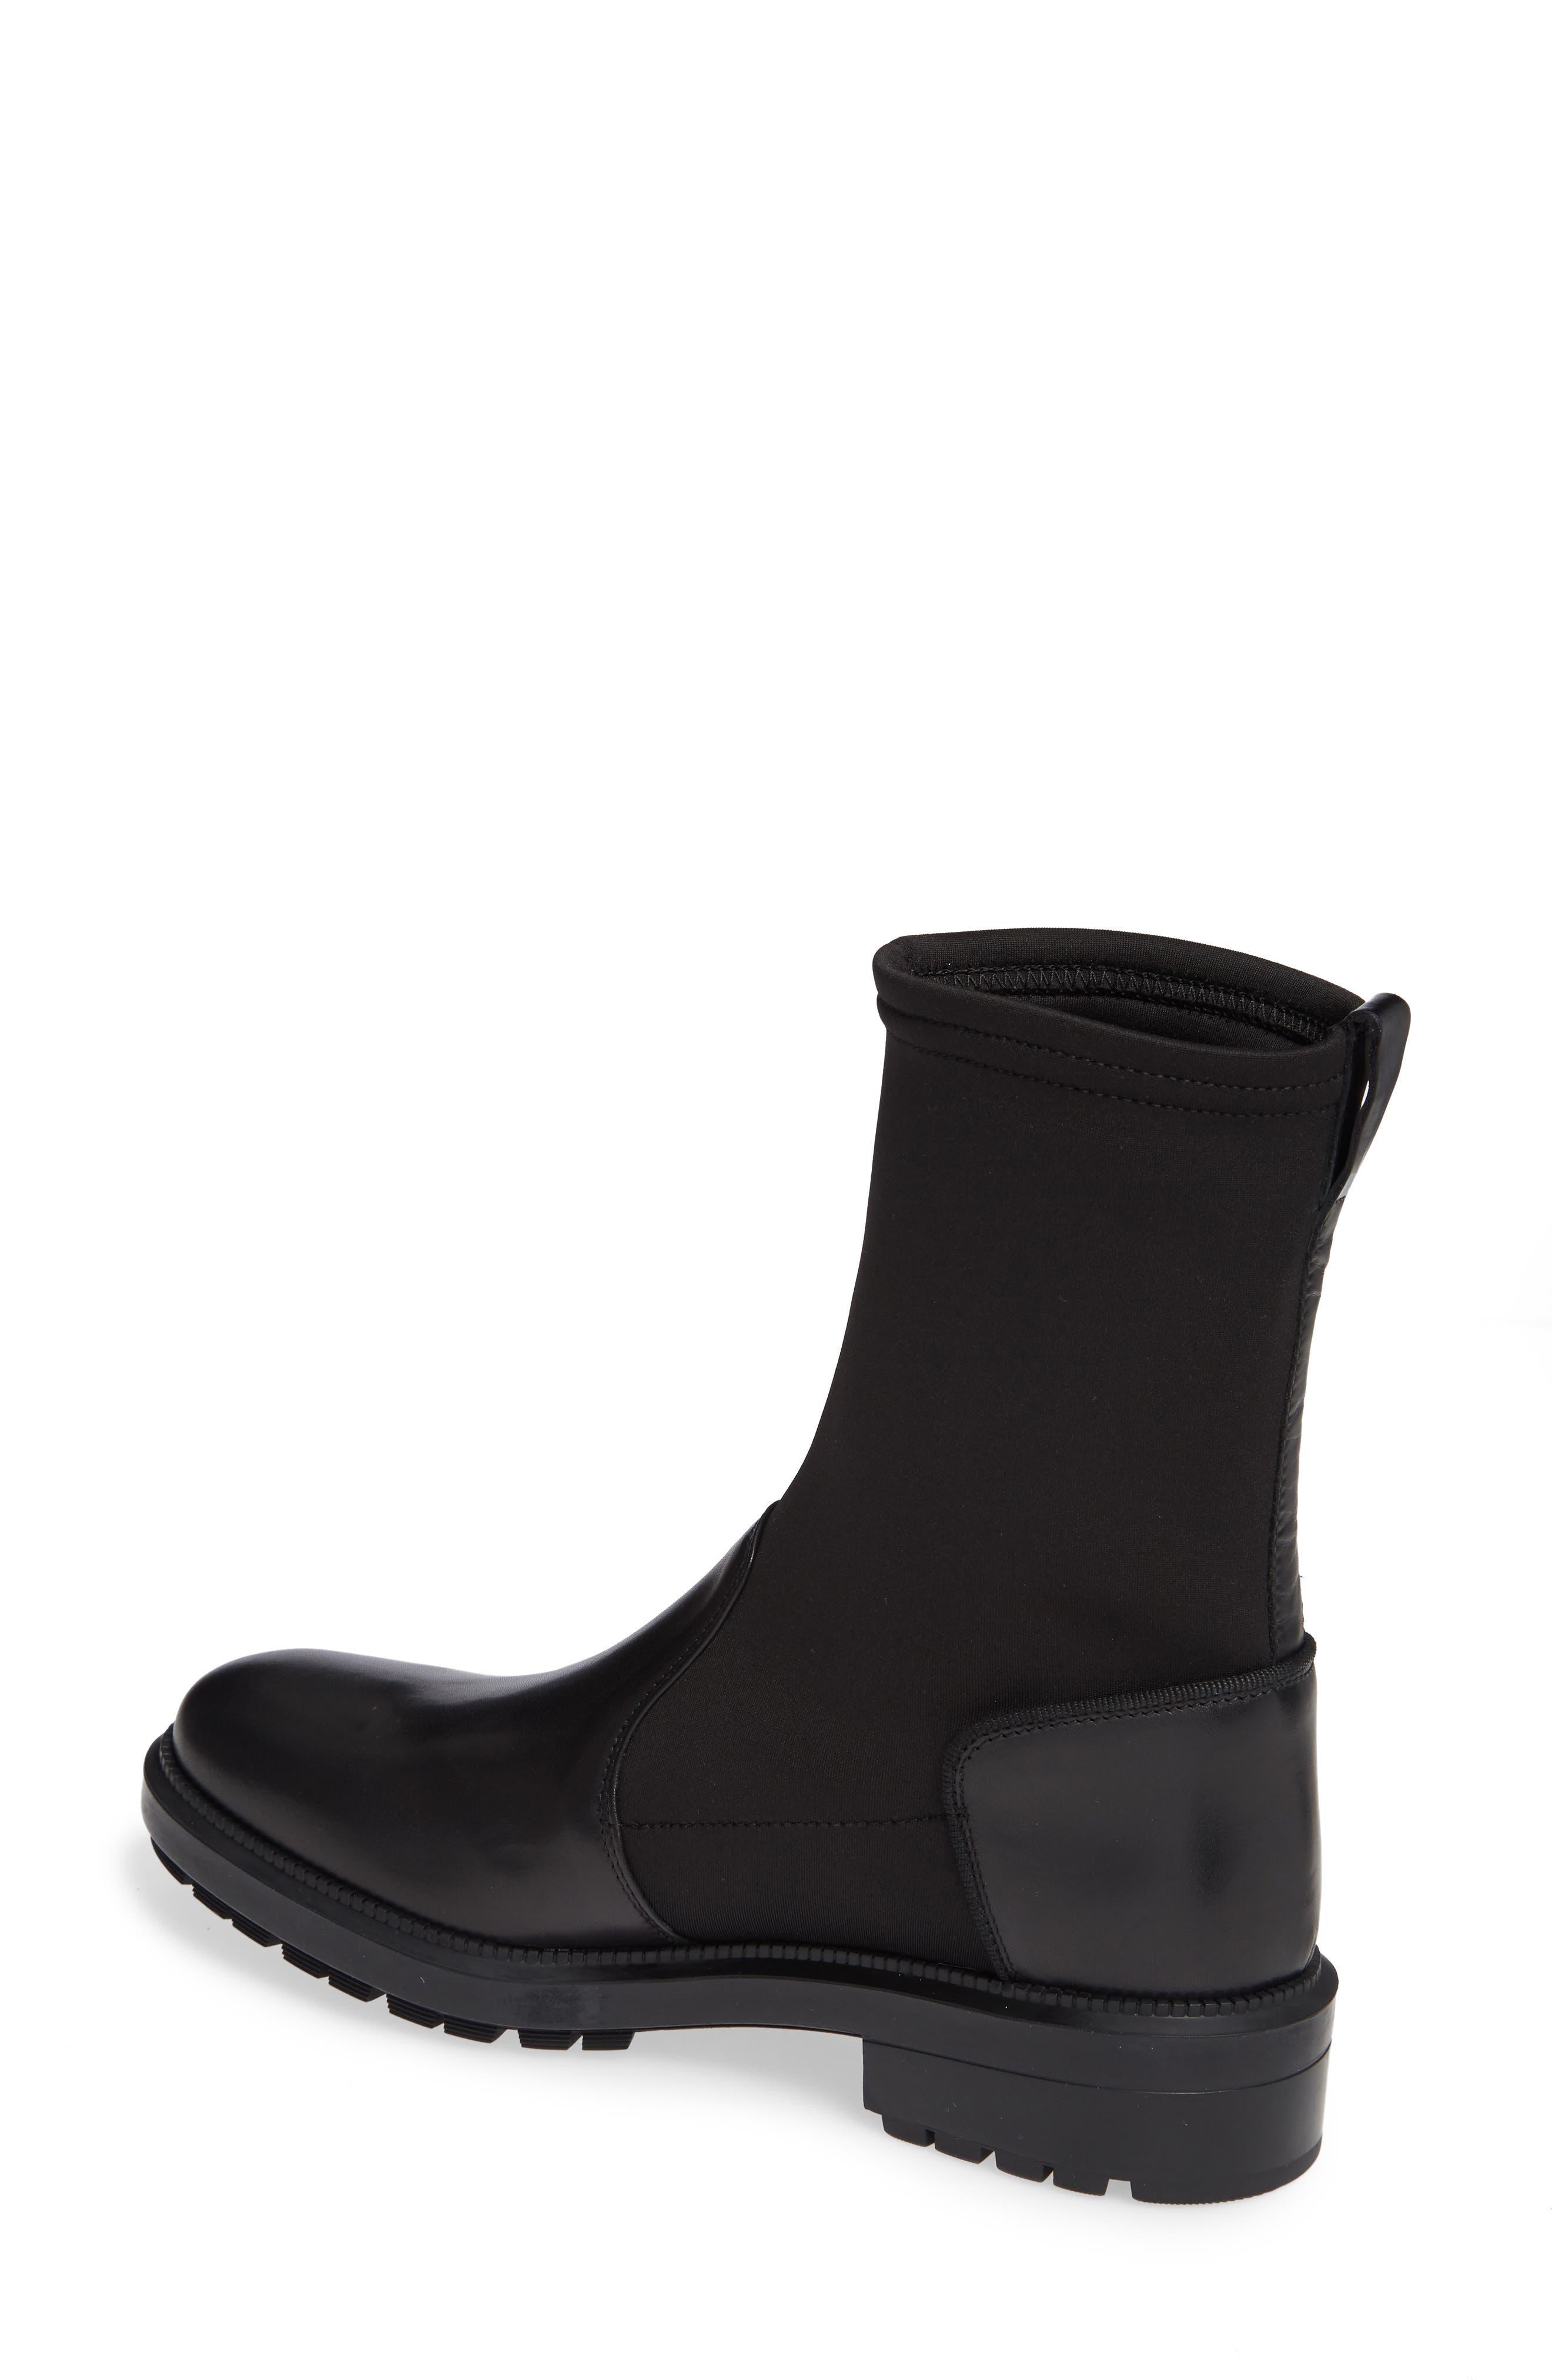 Leoda Ankle Boot,                             Alternate thumbnail 2, color,                             BLACK